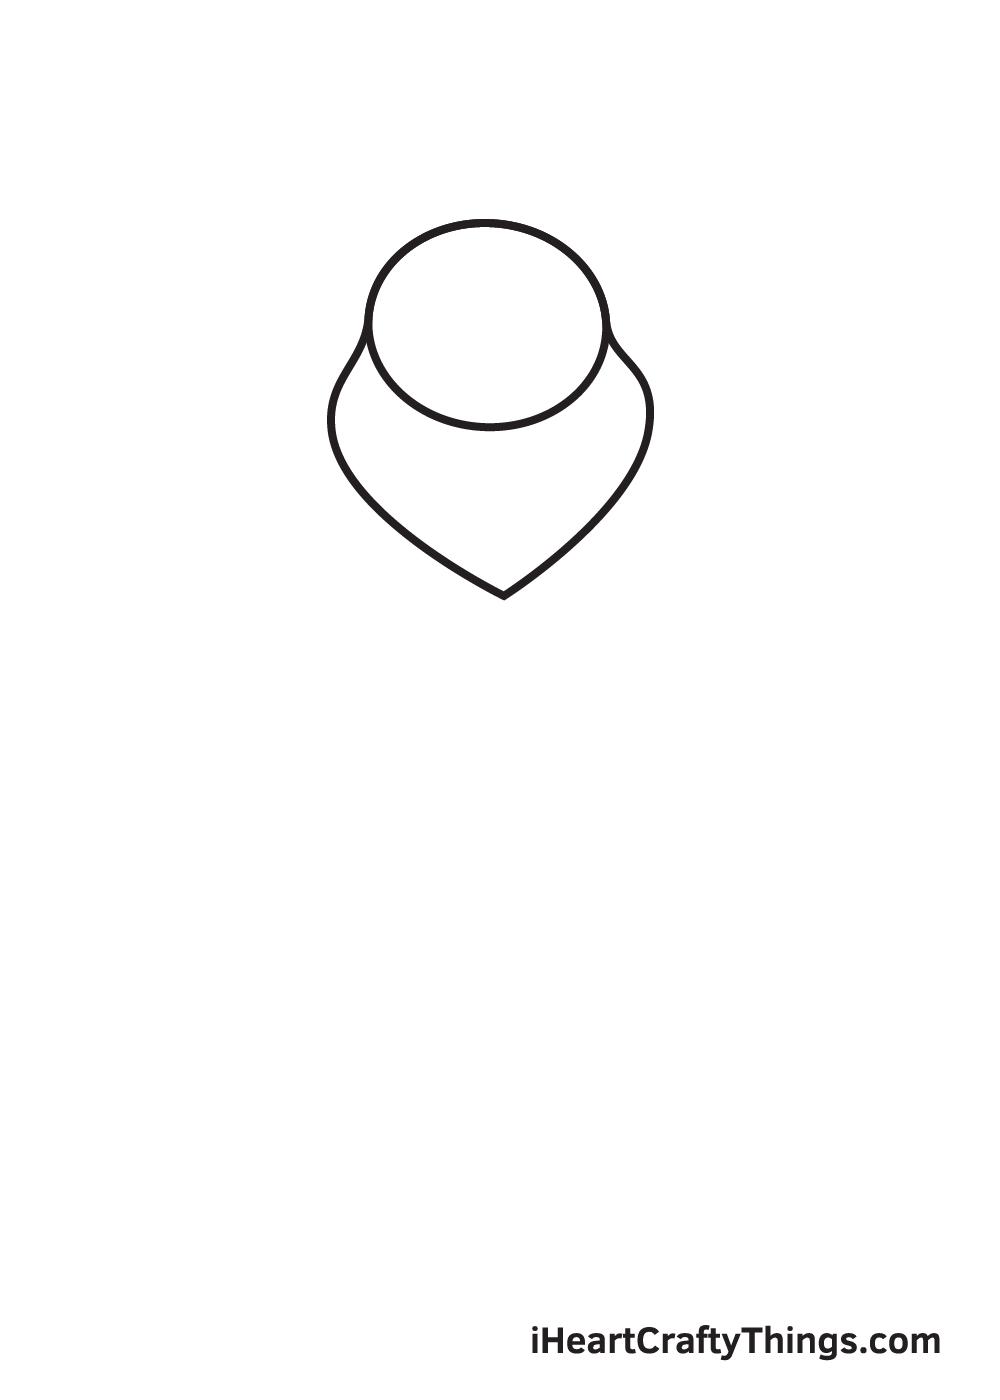 winnie the pooh drawing step 2